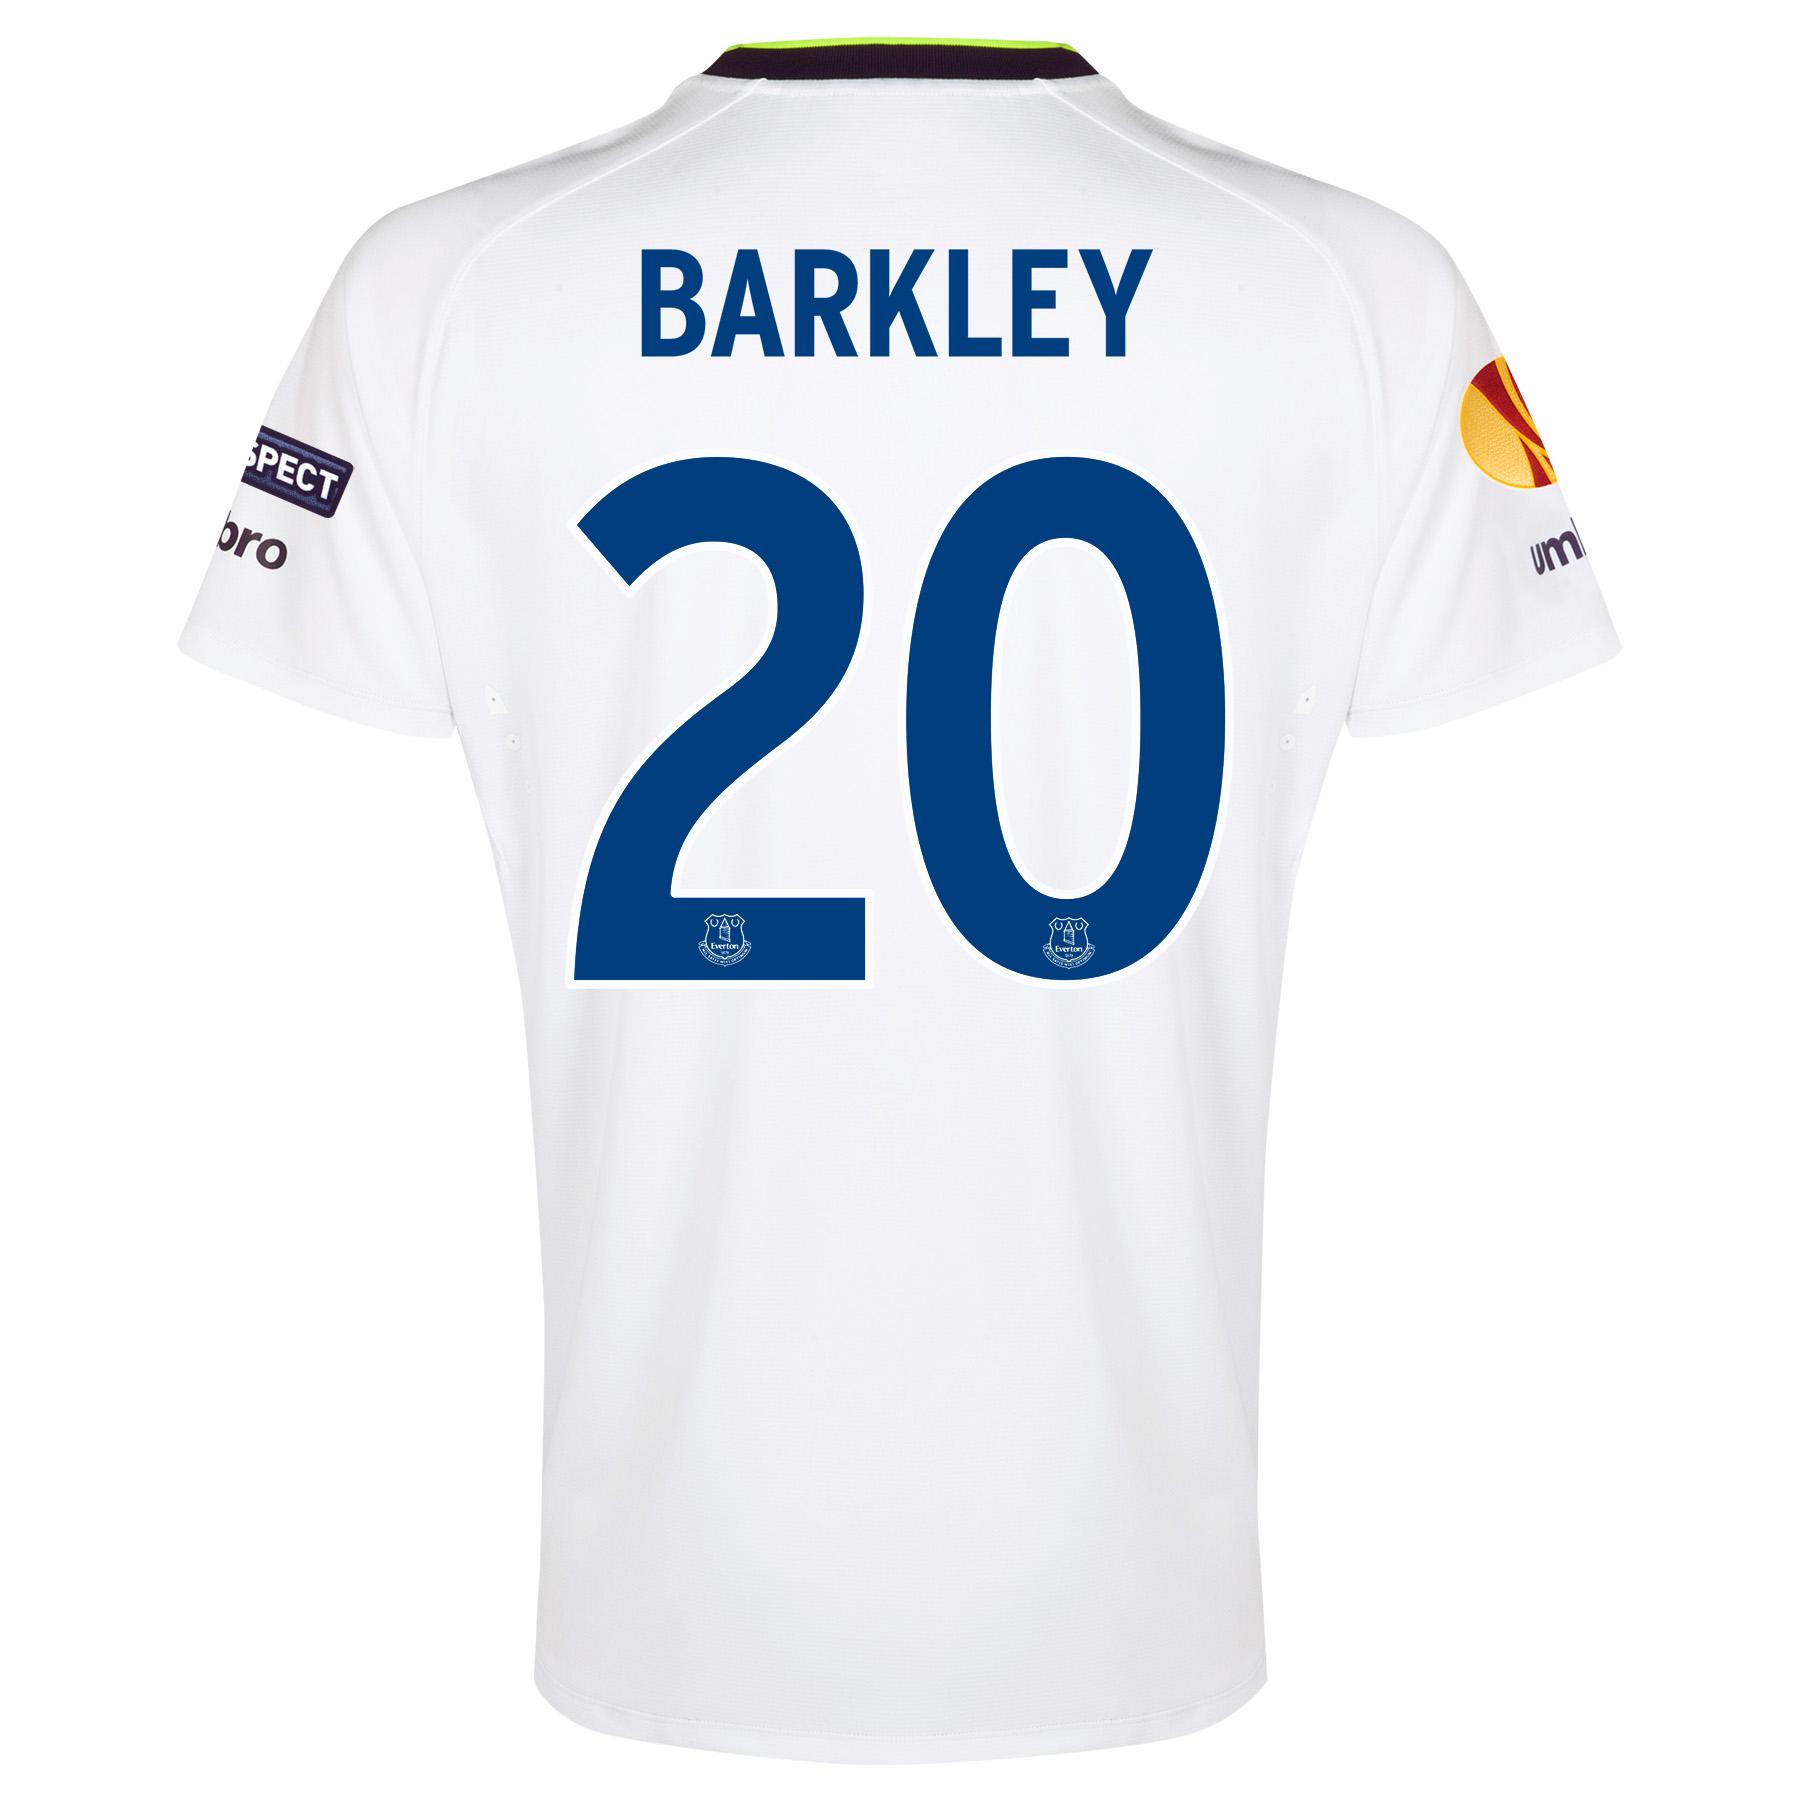 Everton UEFA Europa League 3rd Shirt 2014/15 with Barkley 20 printing